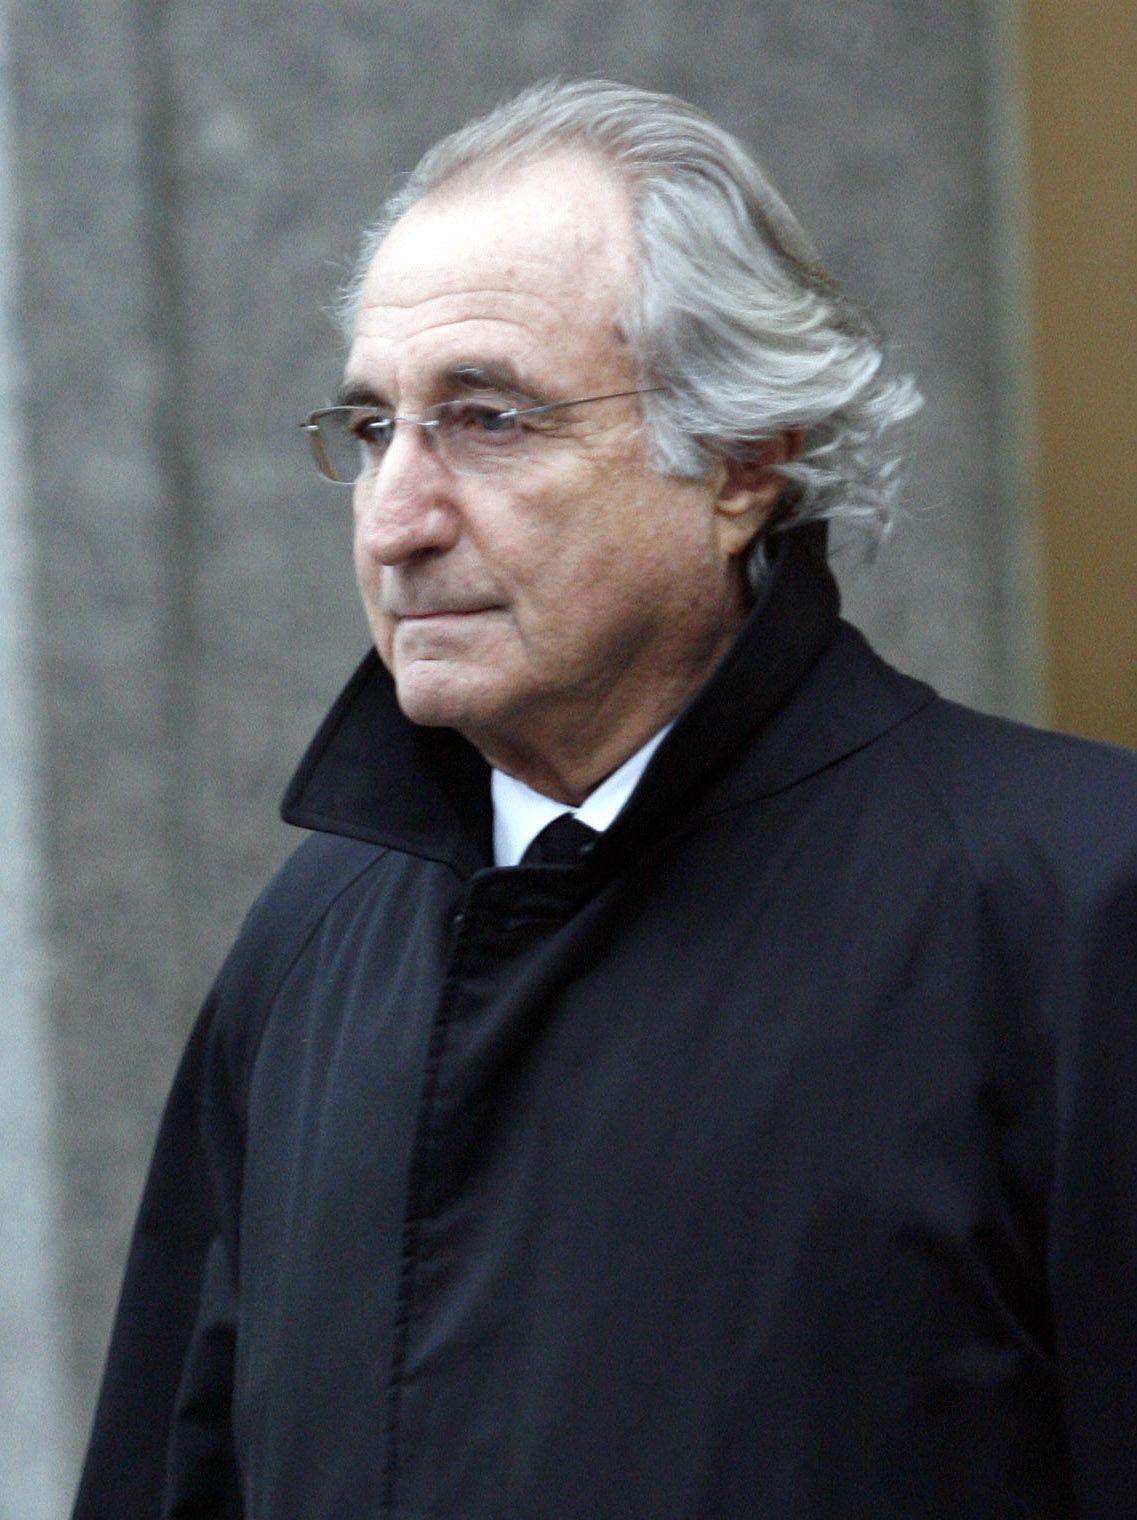 Bernie Madoff / Auktion 2010